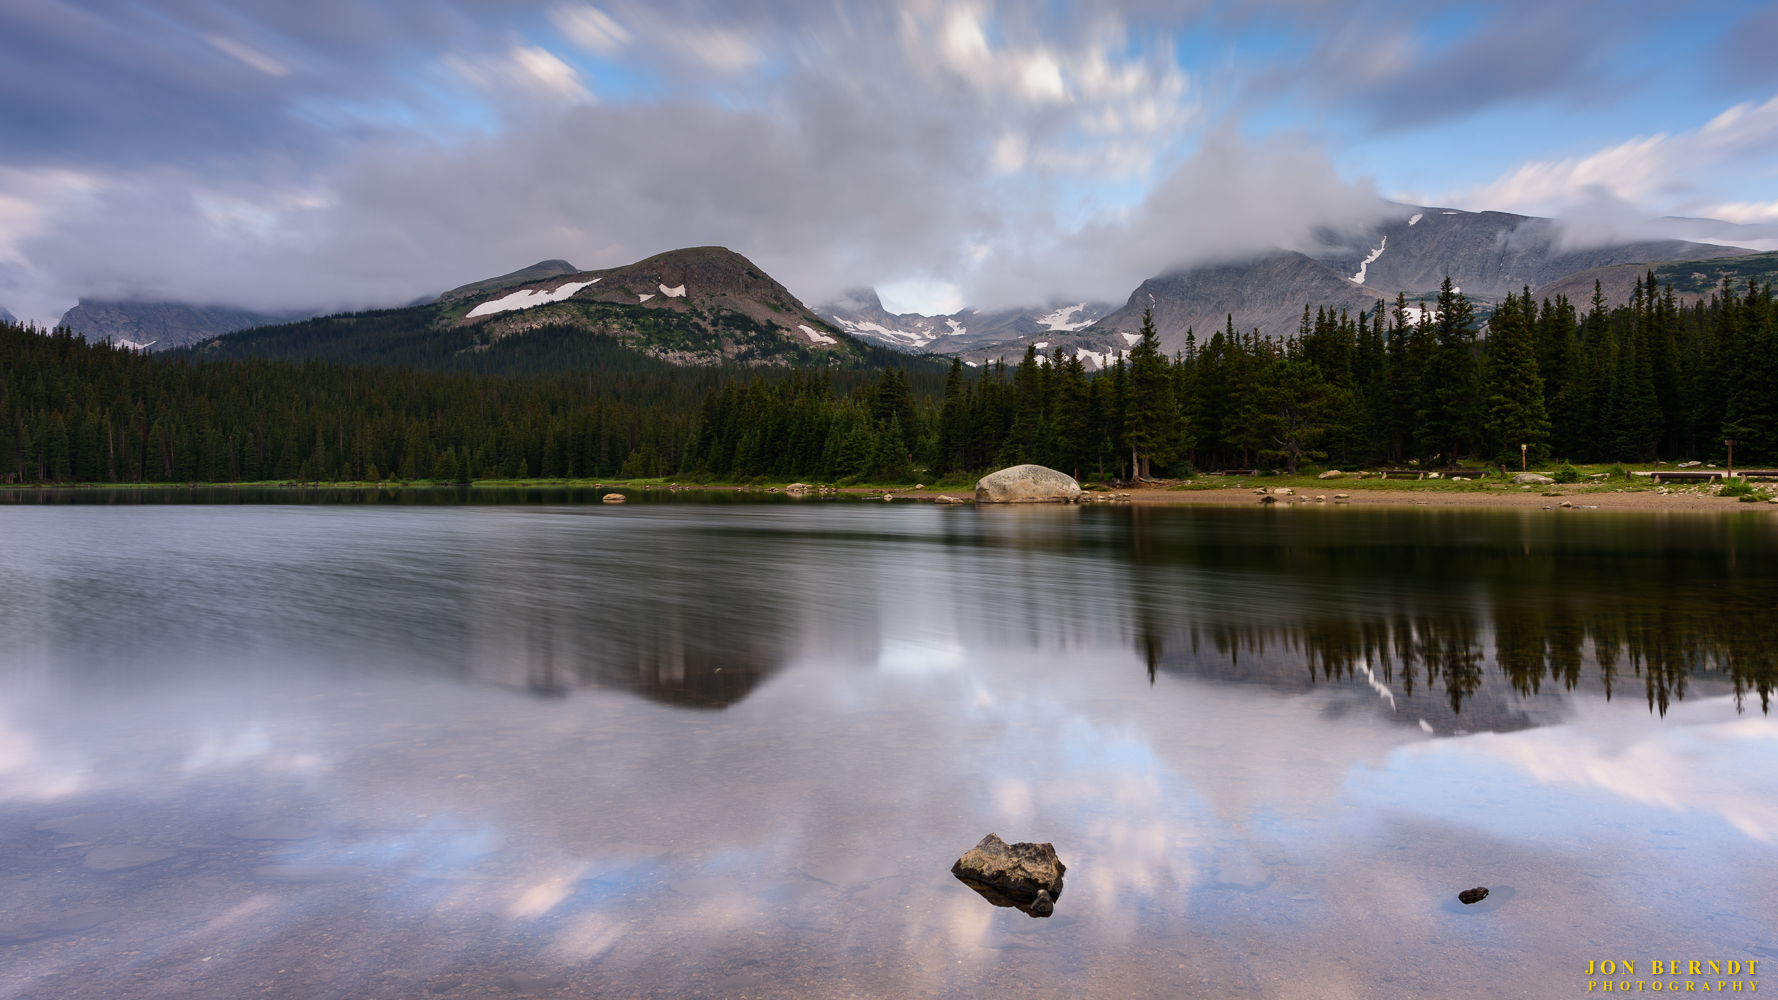 Morning at Brainard Lake. Mount Audubon is shrouded by clouds at its peak.(C) 2017 Jon Berndt Photography